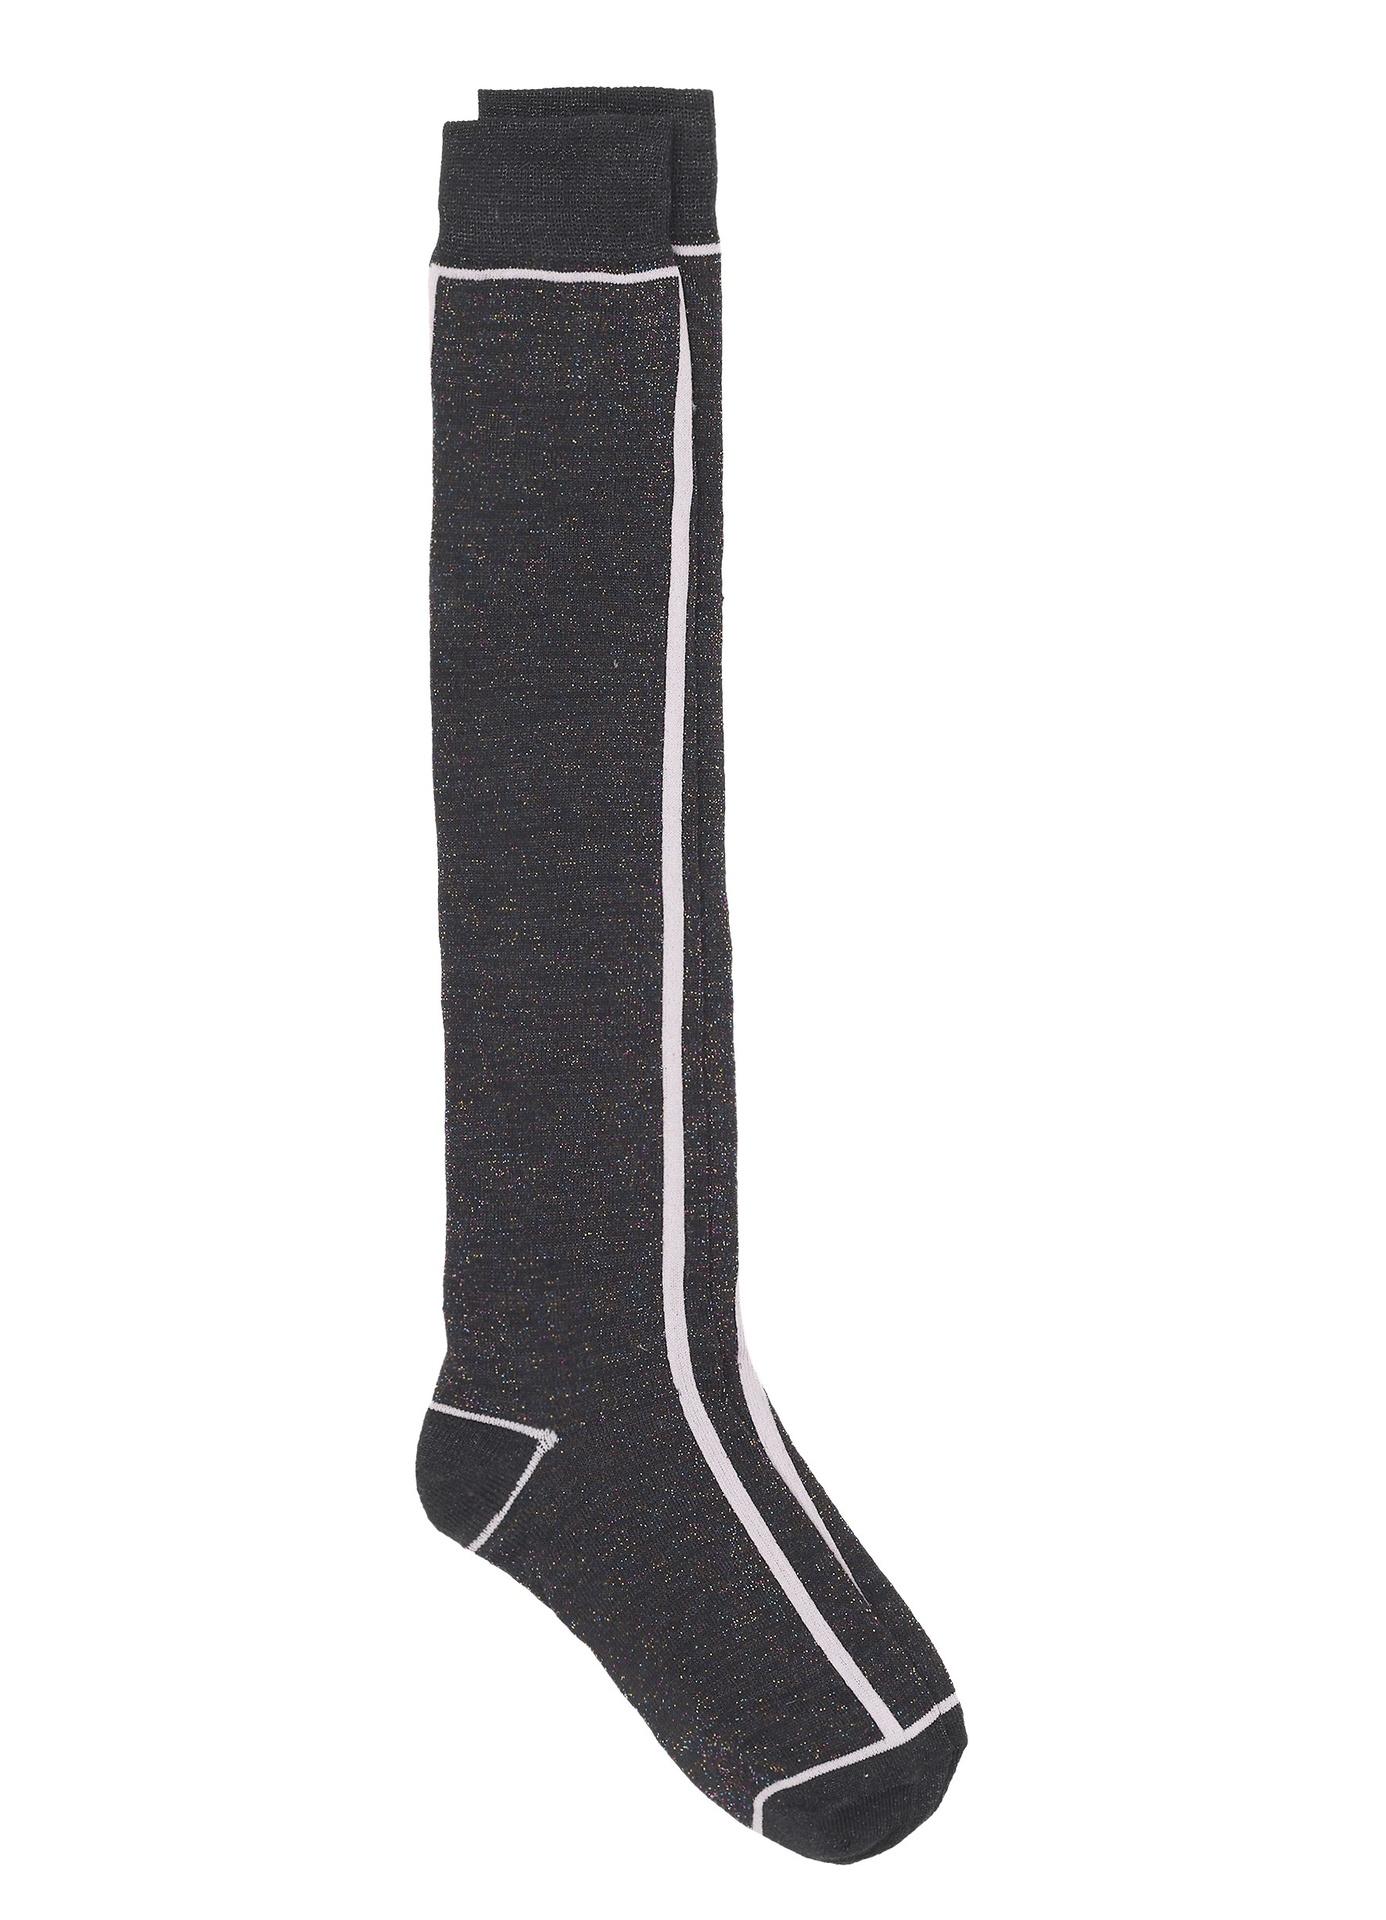 Becksondergaard Duca Needle socks